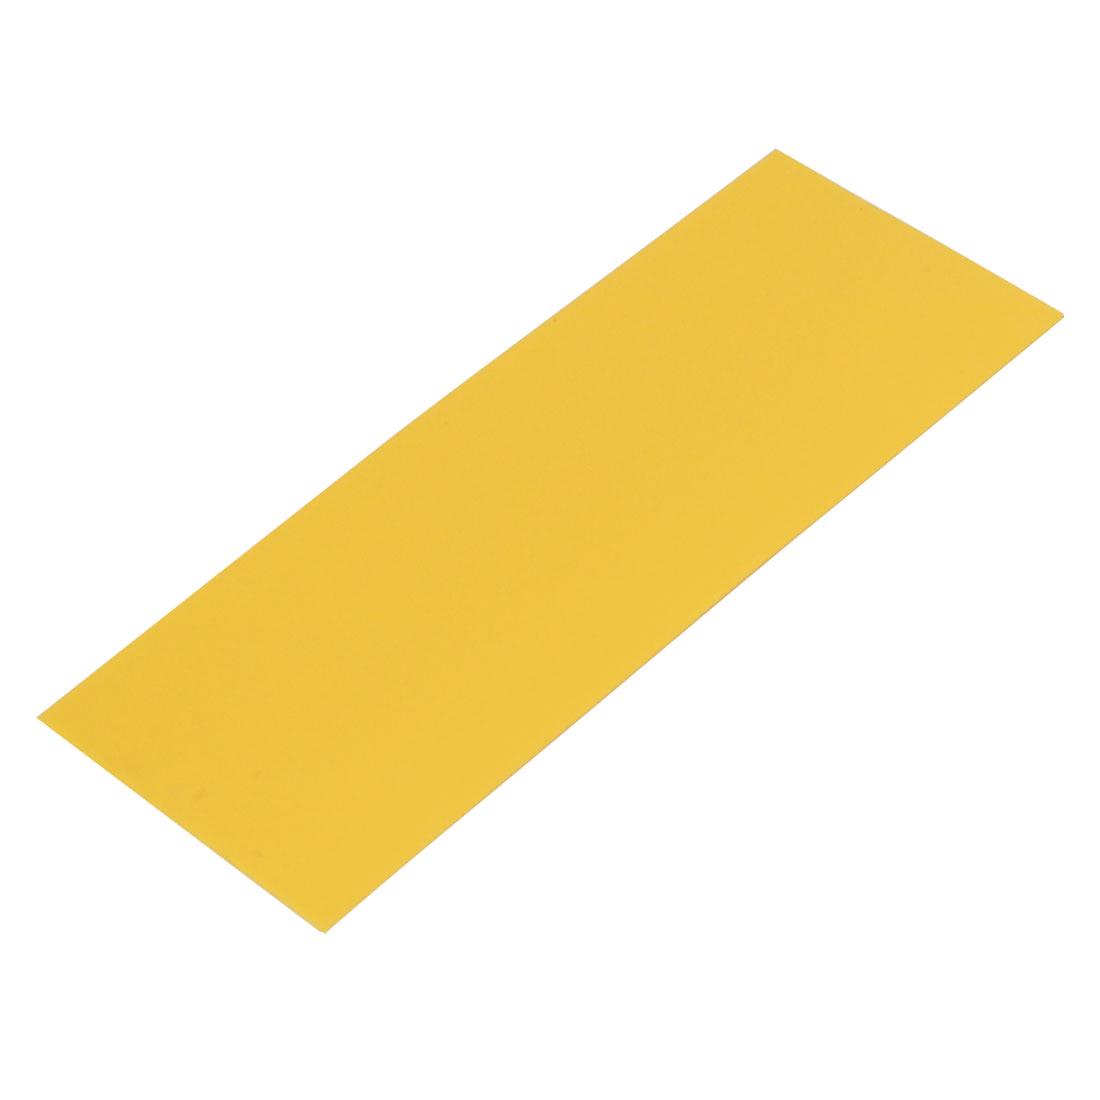 17mm Flat Width 46mm Long PVC Heat Shrinkable Tube Yellow for AAA Battery